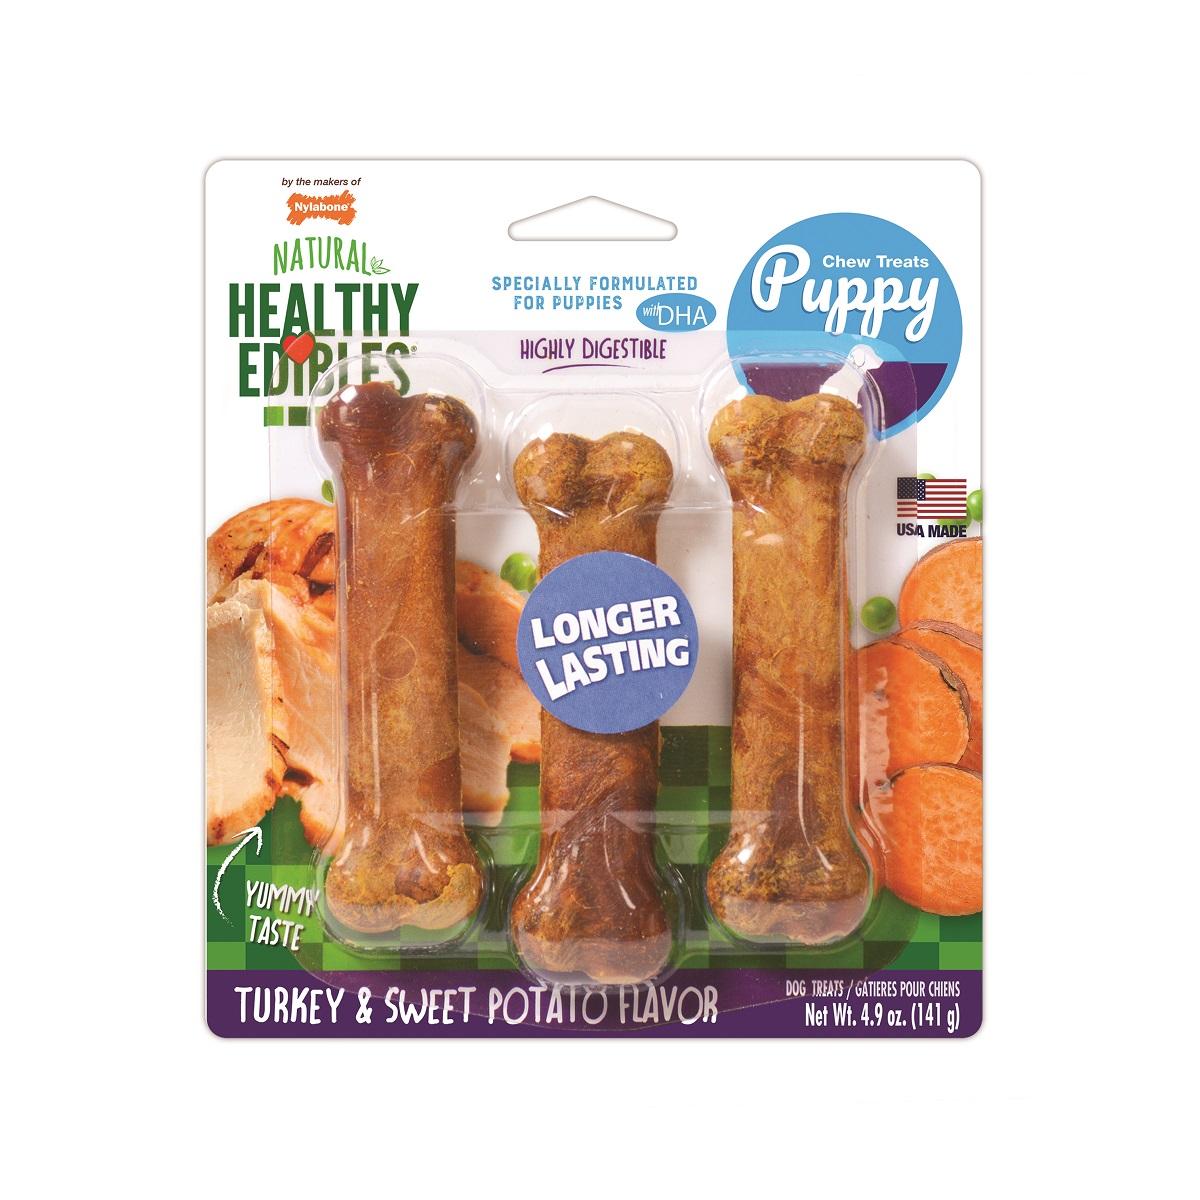 Nylabone Healthy Edibles Longer Lasting Turkey & Sweet Potato Flavor Puppy Dog Treats, Regular, 3-count